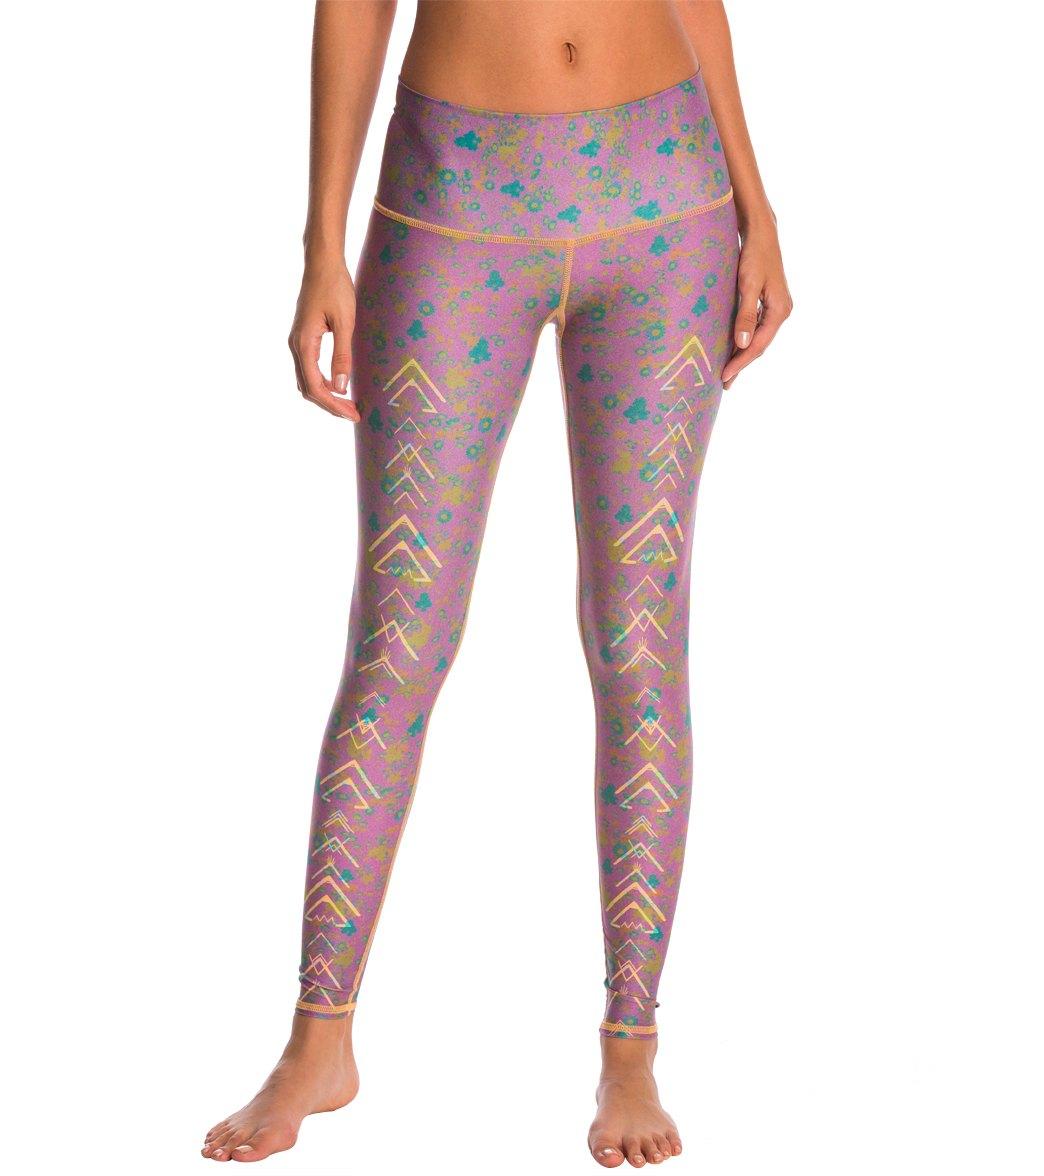 70fd8575a3cf50 Teeki Meadow Hot Pants at SwimOutlet.com - Free Shipping